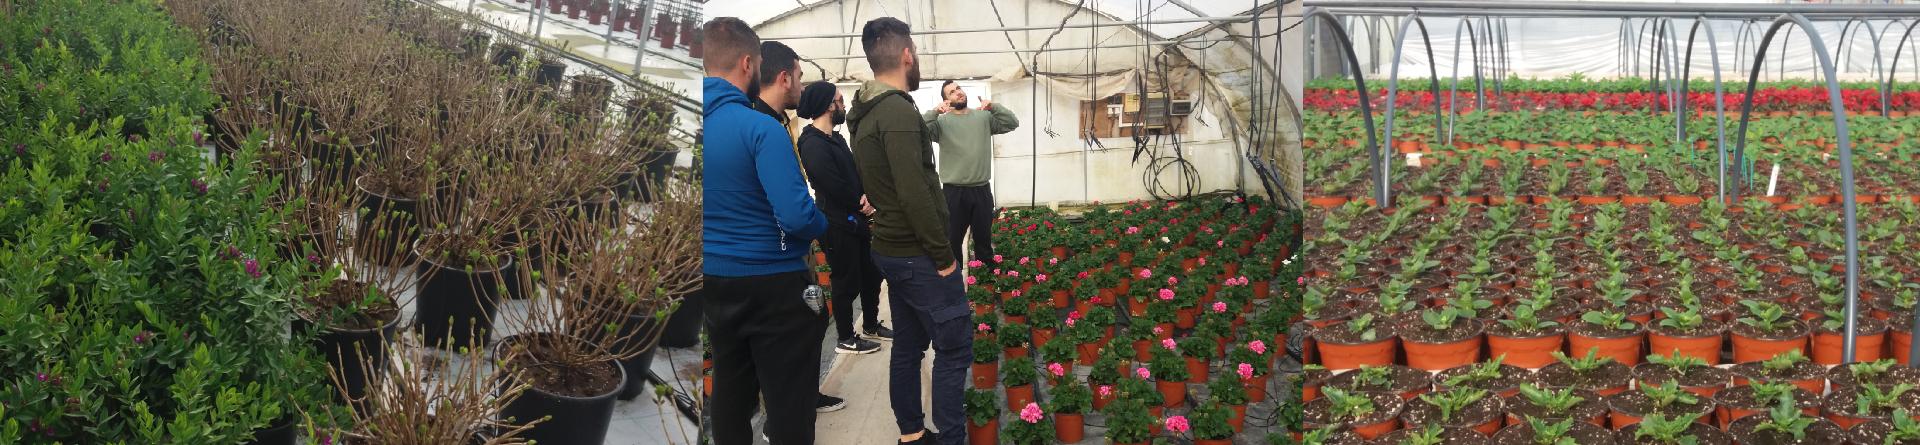 Eκπαιδευτική επίσκεψη φοιτητών σε σύγχρονα υδροπονικά φυτώρια γλαστρικών φυτών